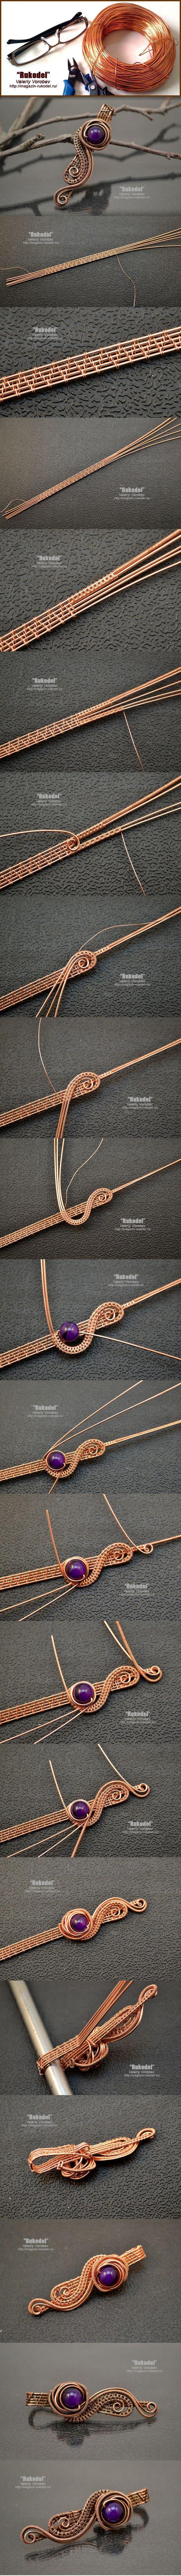 Wire Wrap Pendant - tutorial - http://magazin-rukodel.ru/ | ART ...